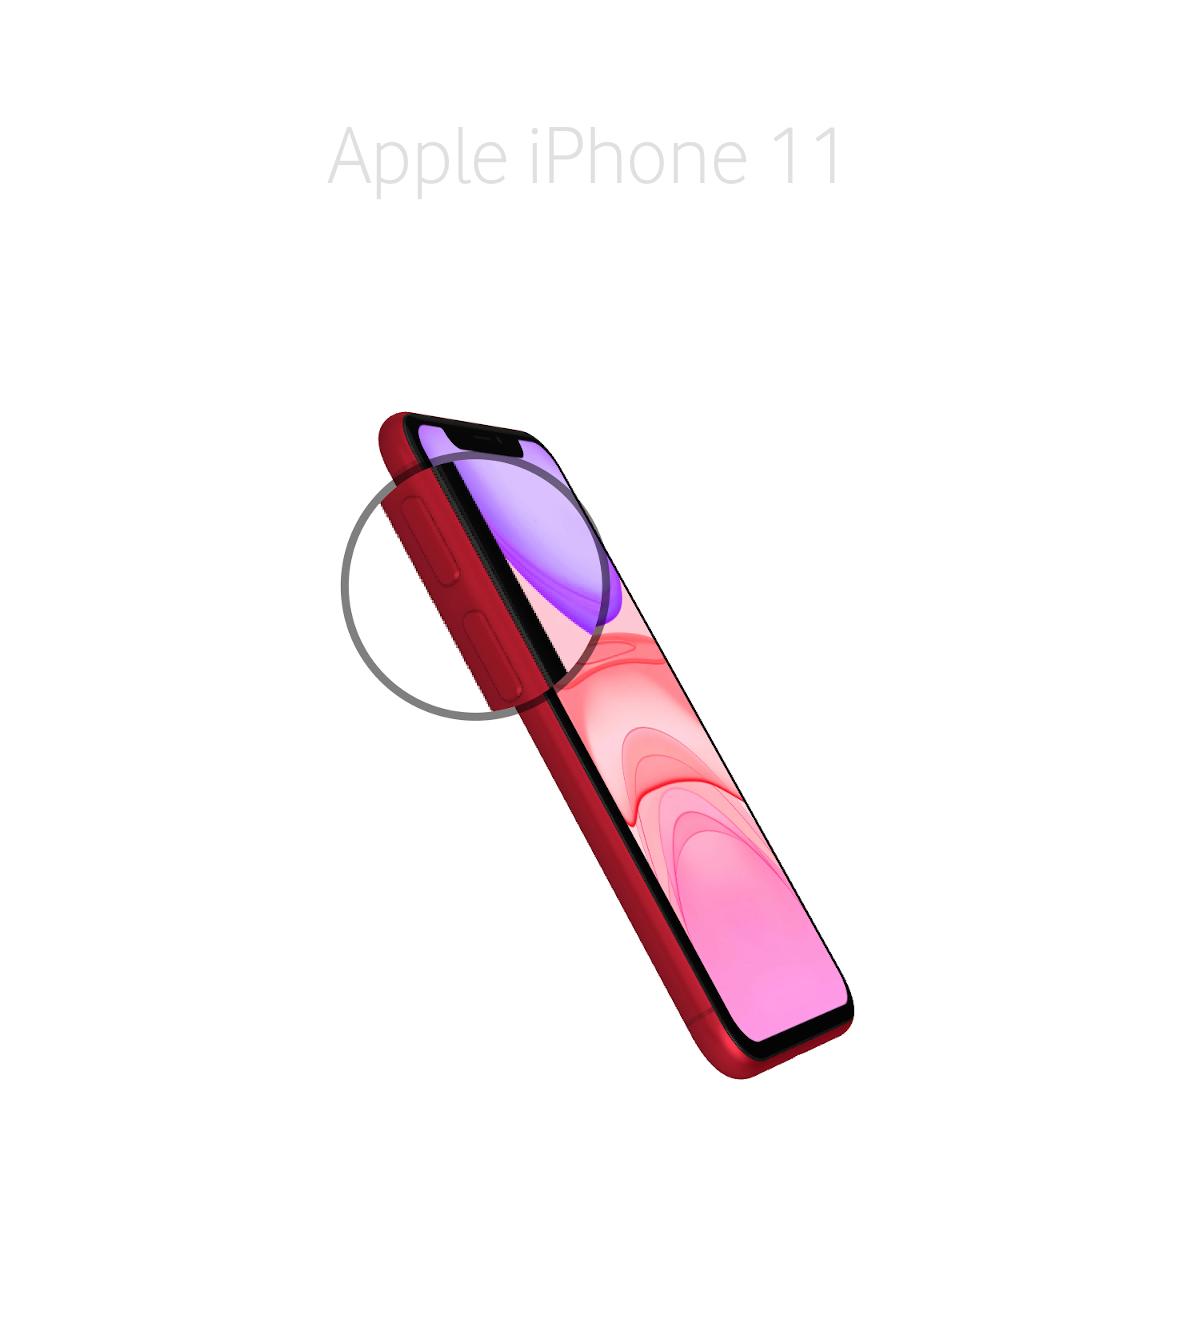 Laga volymknapp iPhone 11